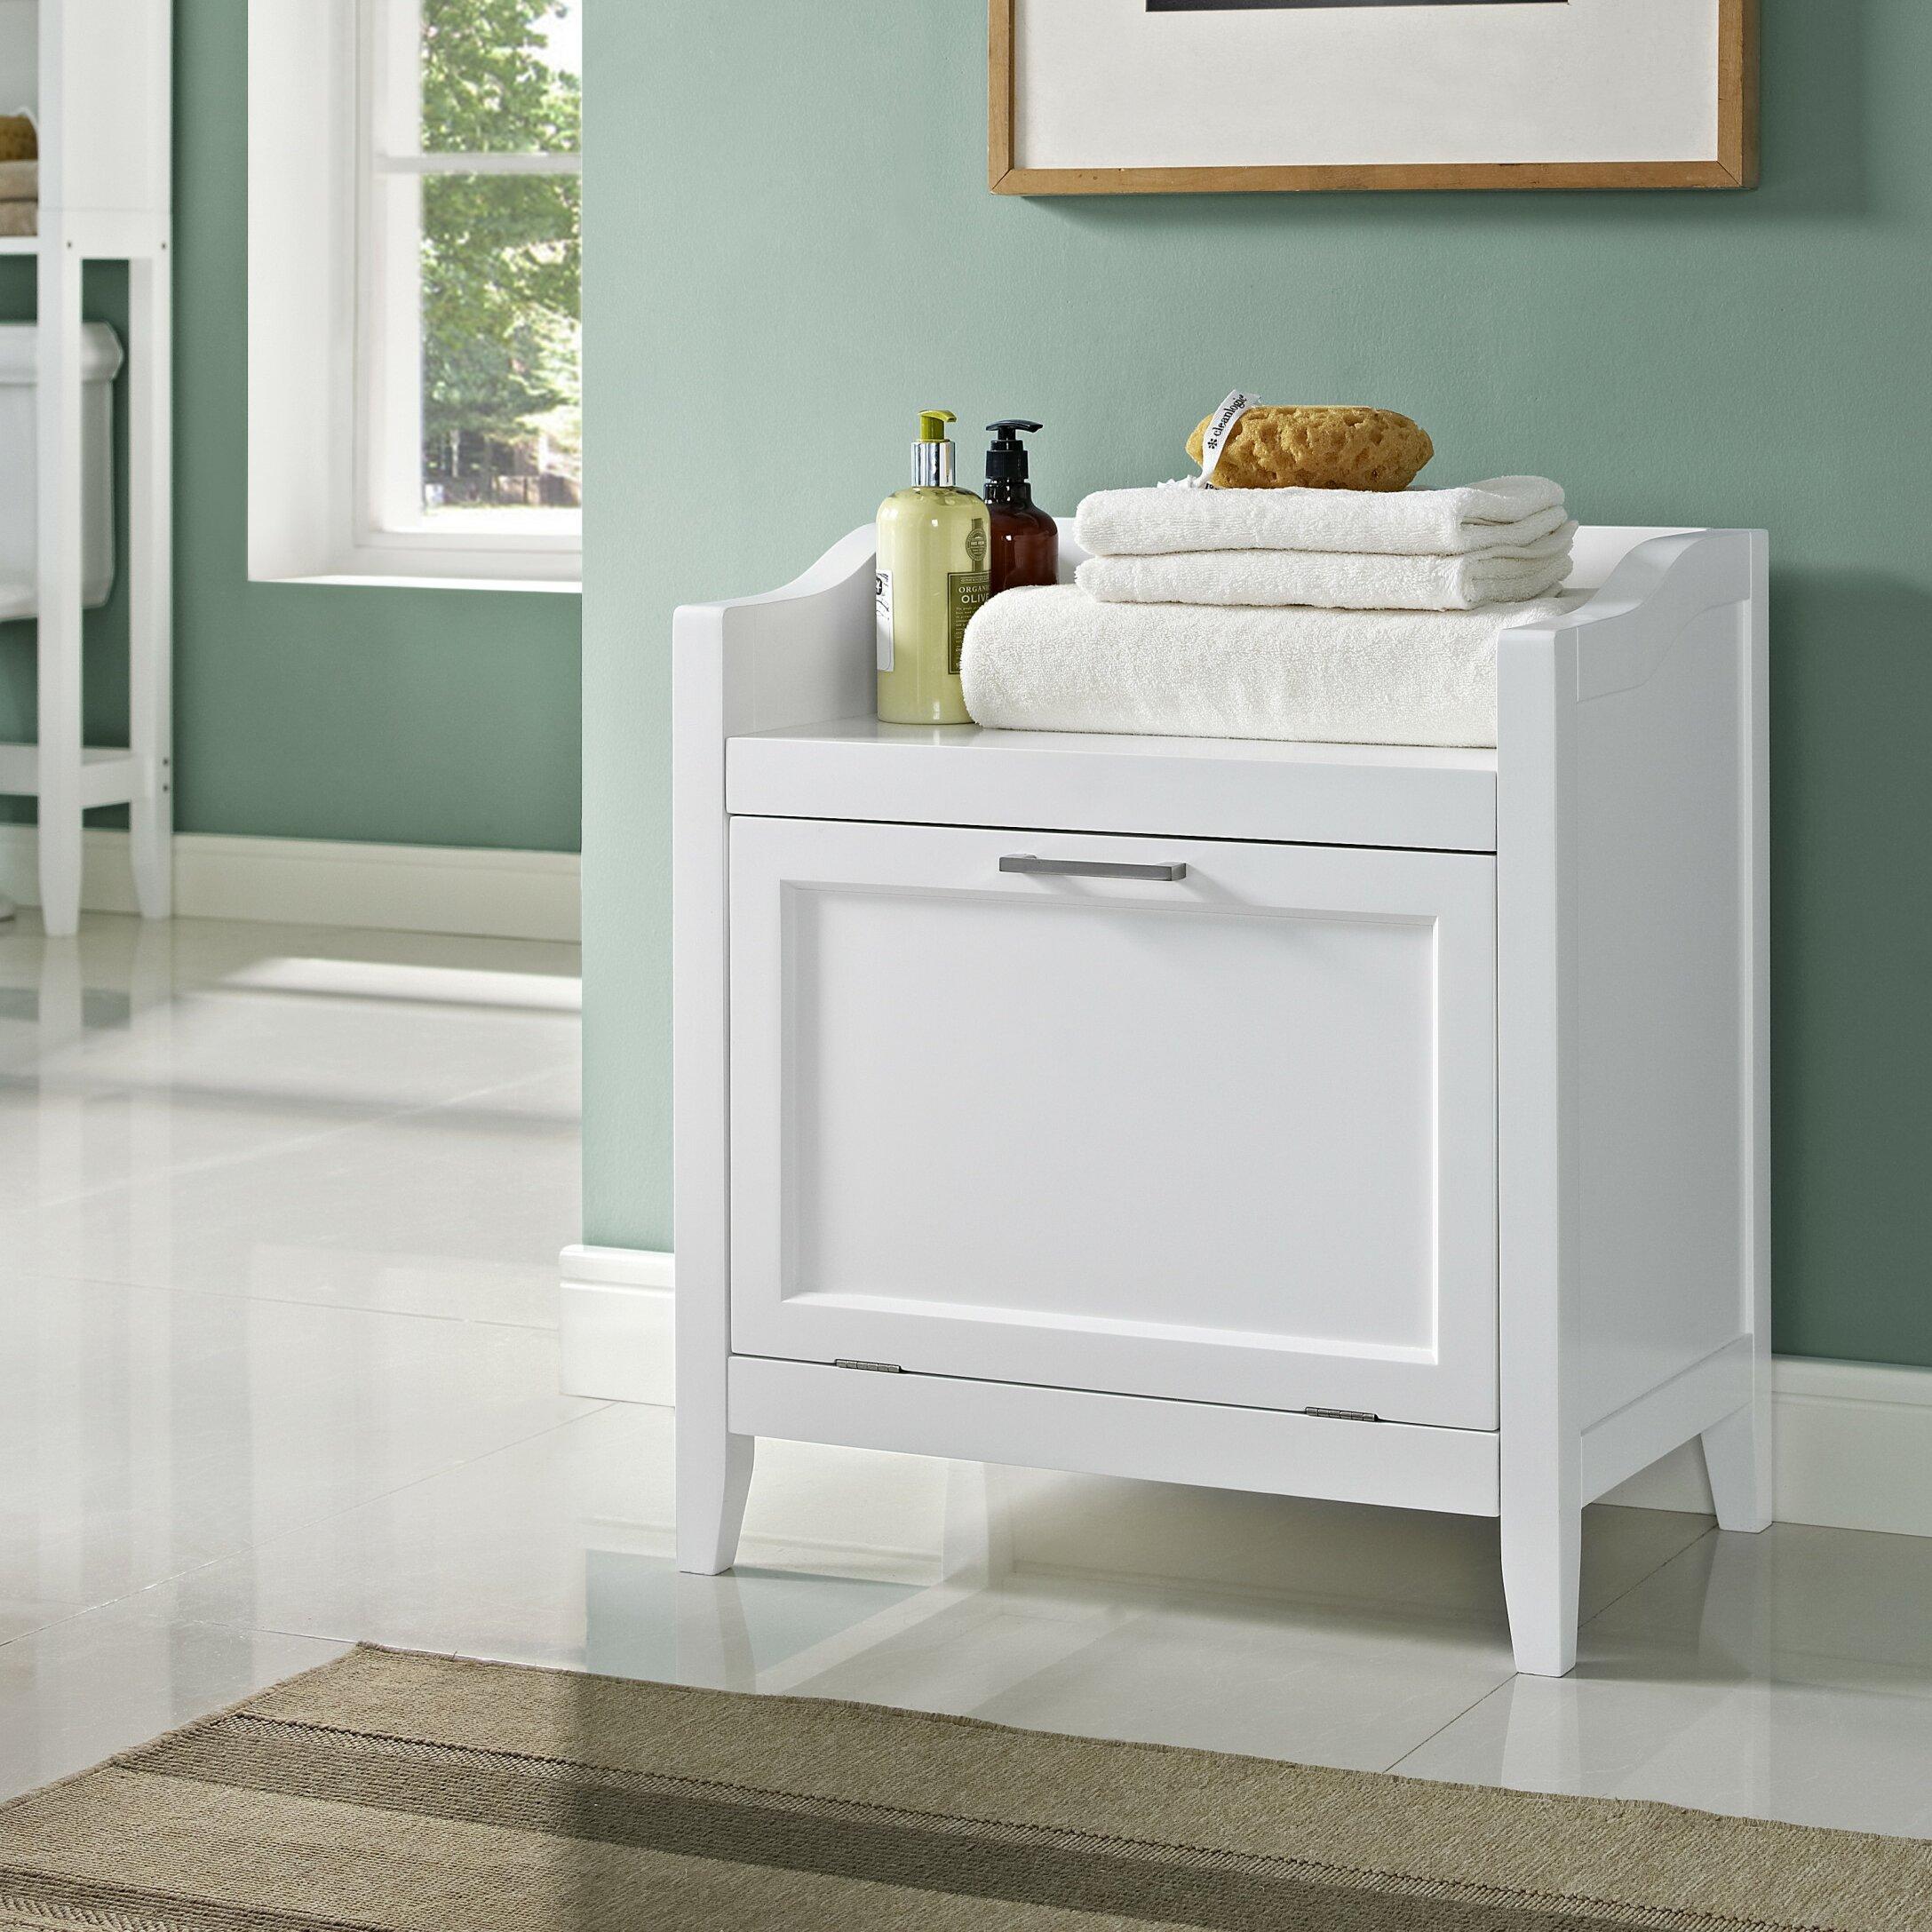 Bathroom storage cabinet with hamper - Simpli Home Avington Storage Cabinet Laundry Hamper